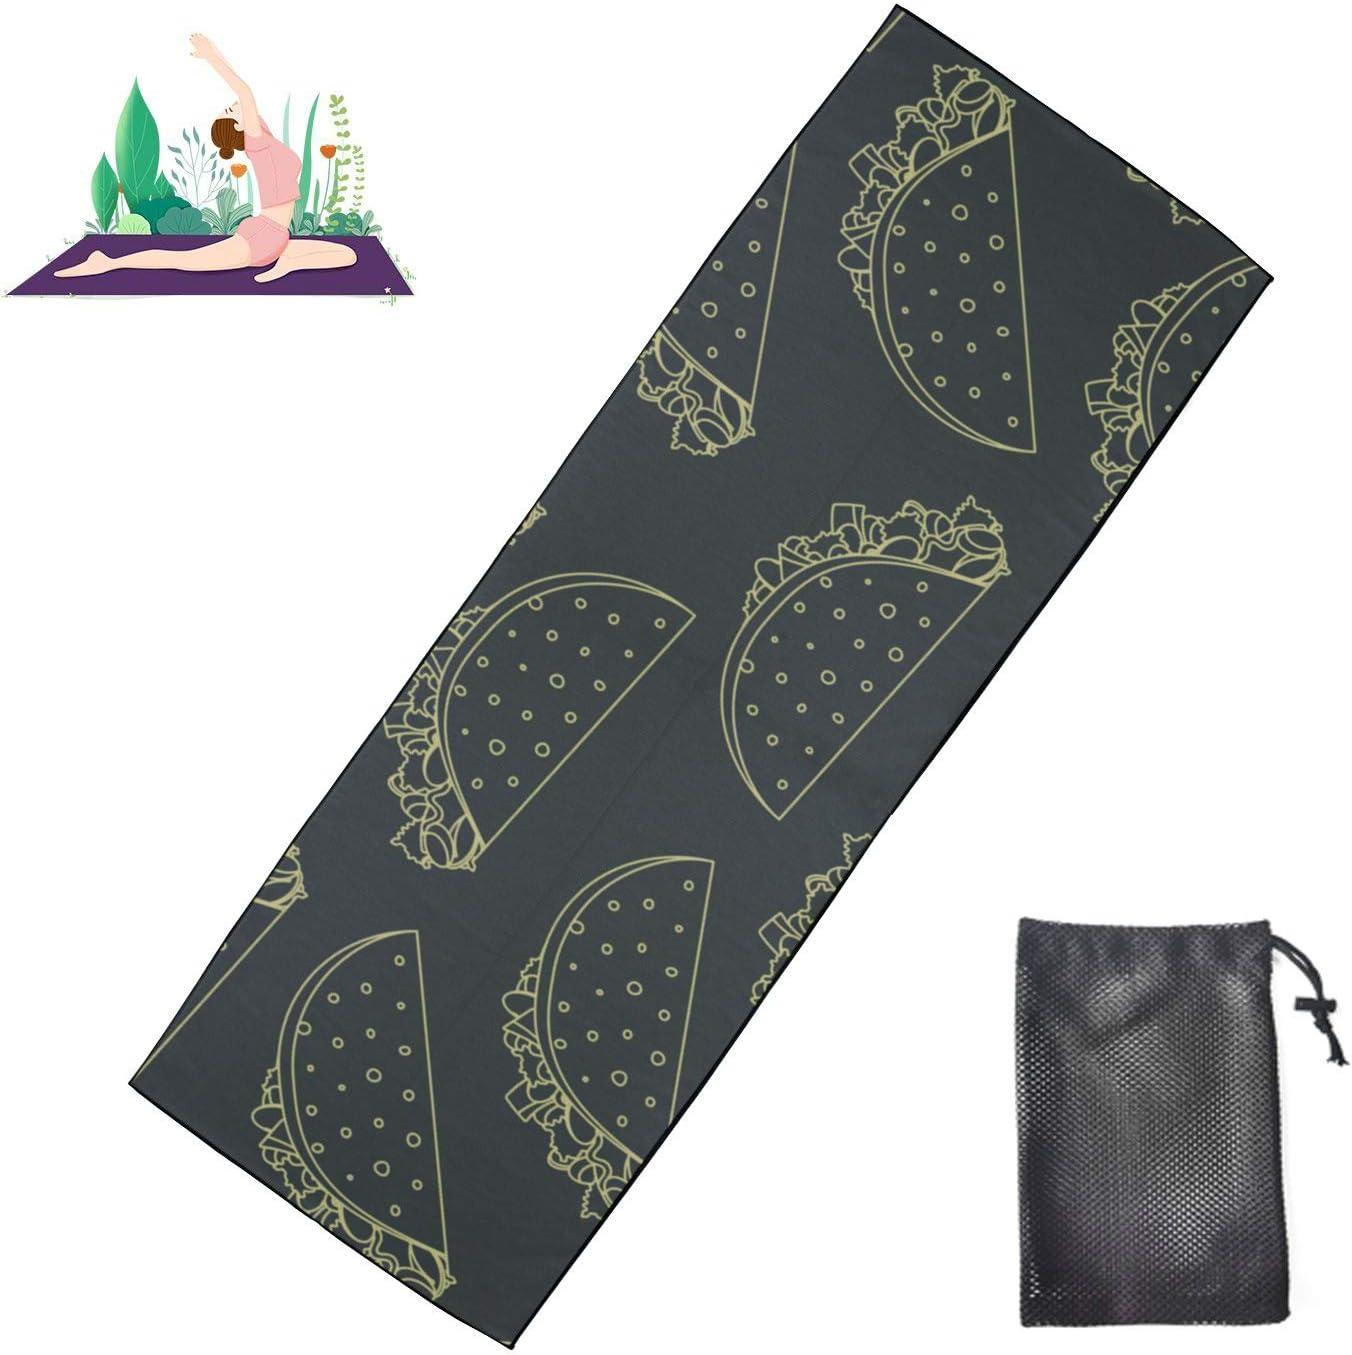 Zaqiwa Soft Yoga Mats Cartoon Food Cheap mail order specialty store Breakfast Towel Sales Sandwich